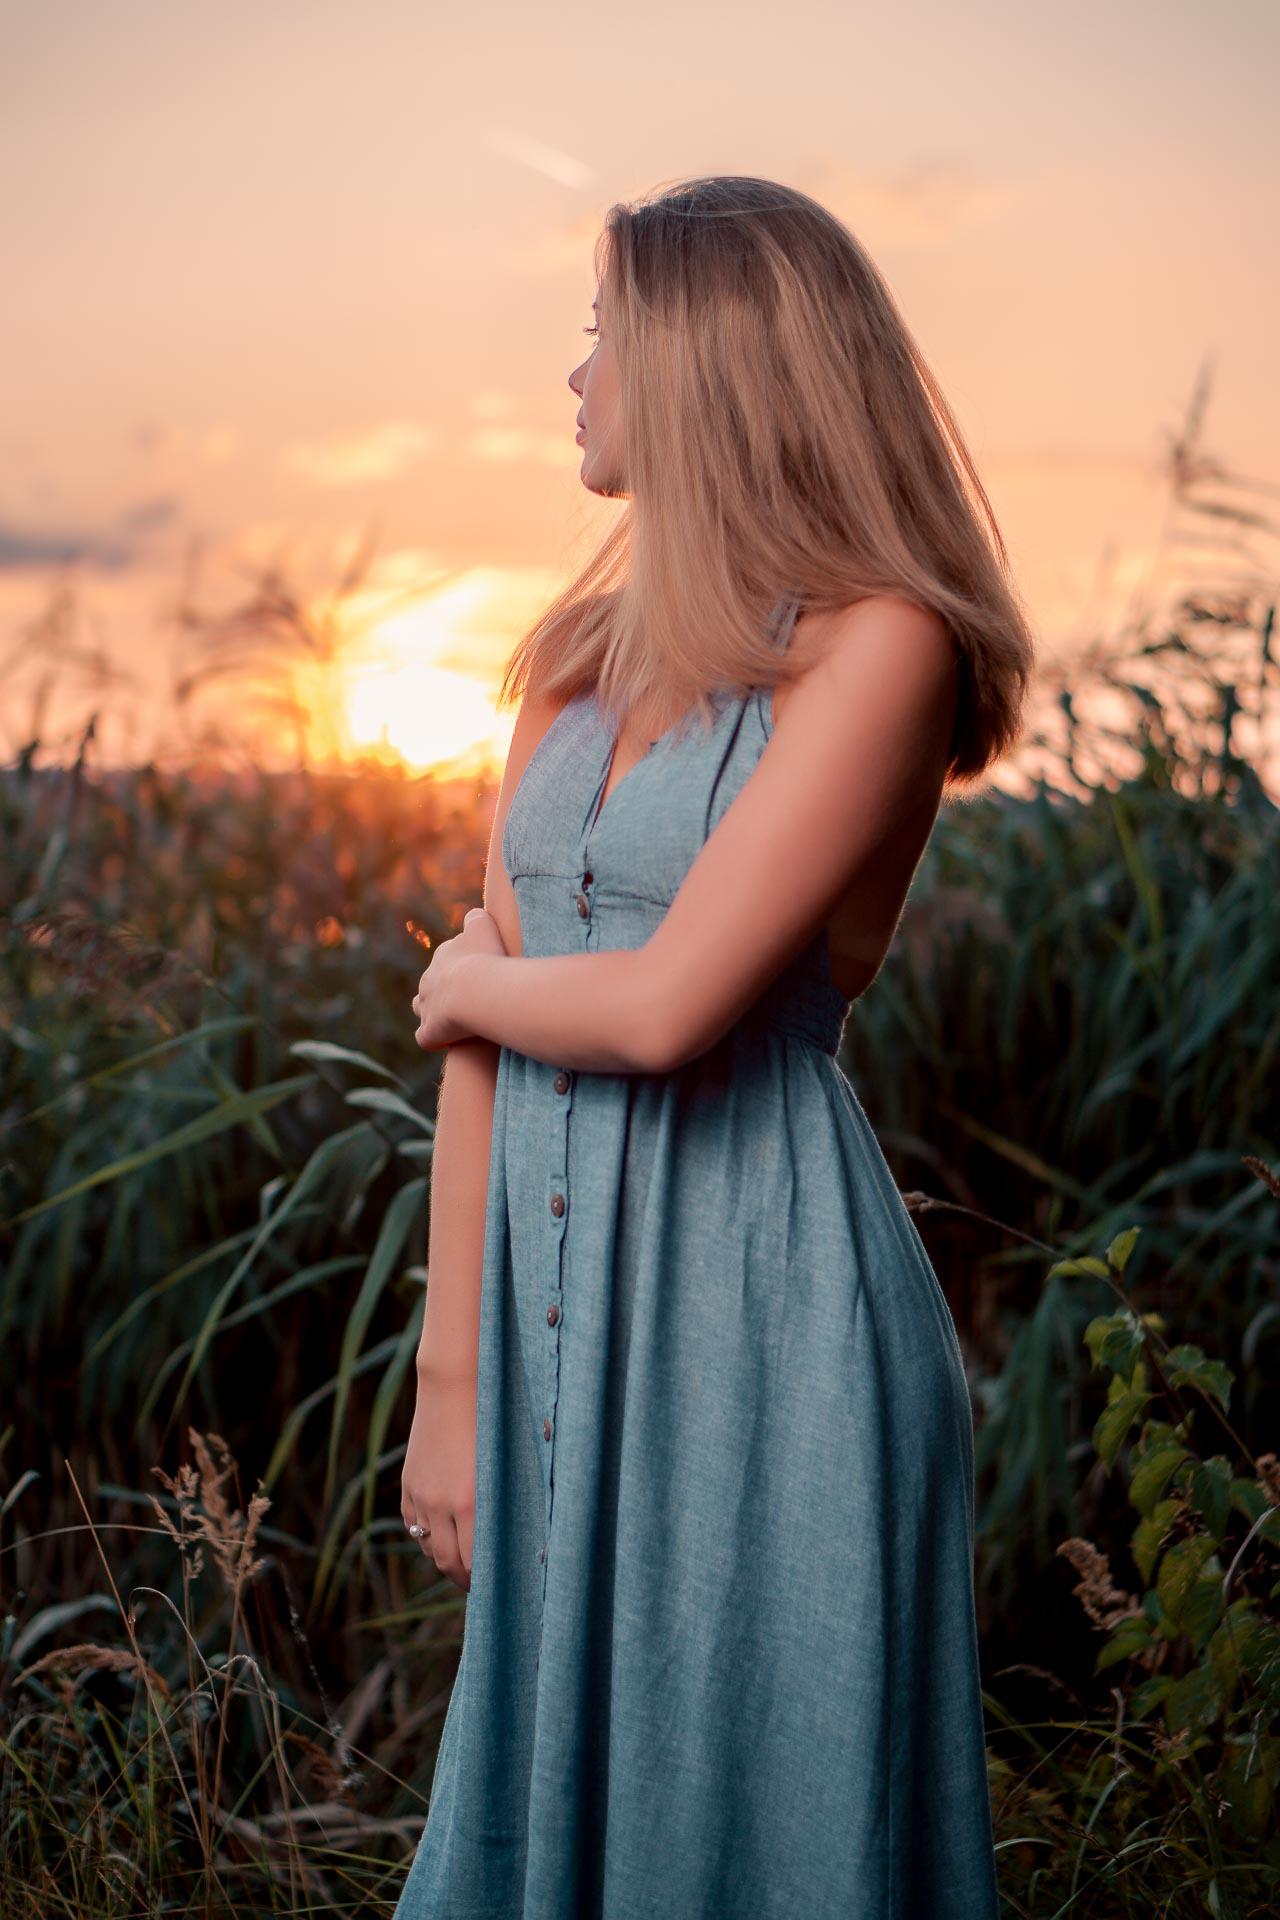 Sophie in Sonnenuntergang blickend